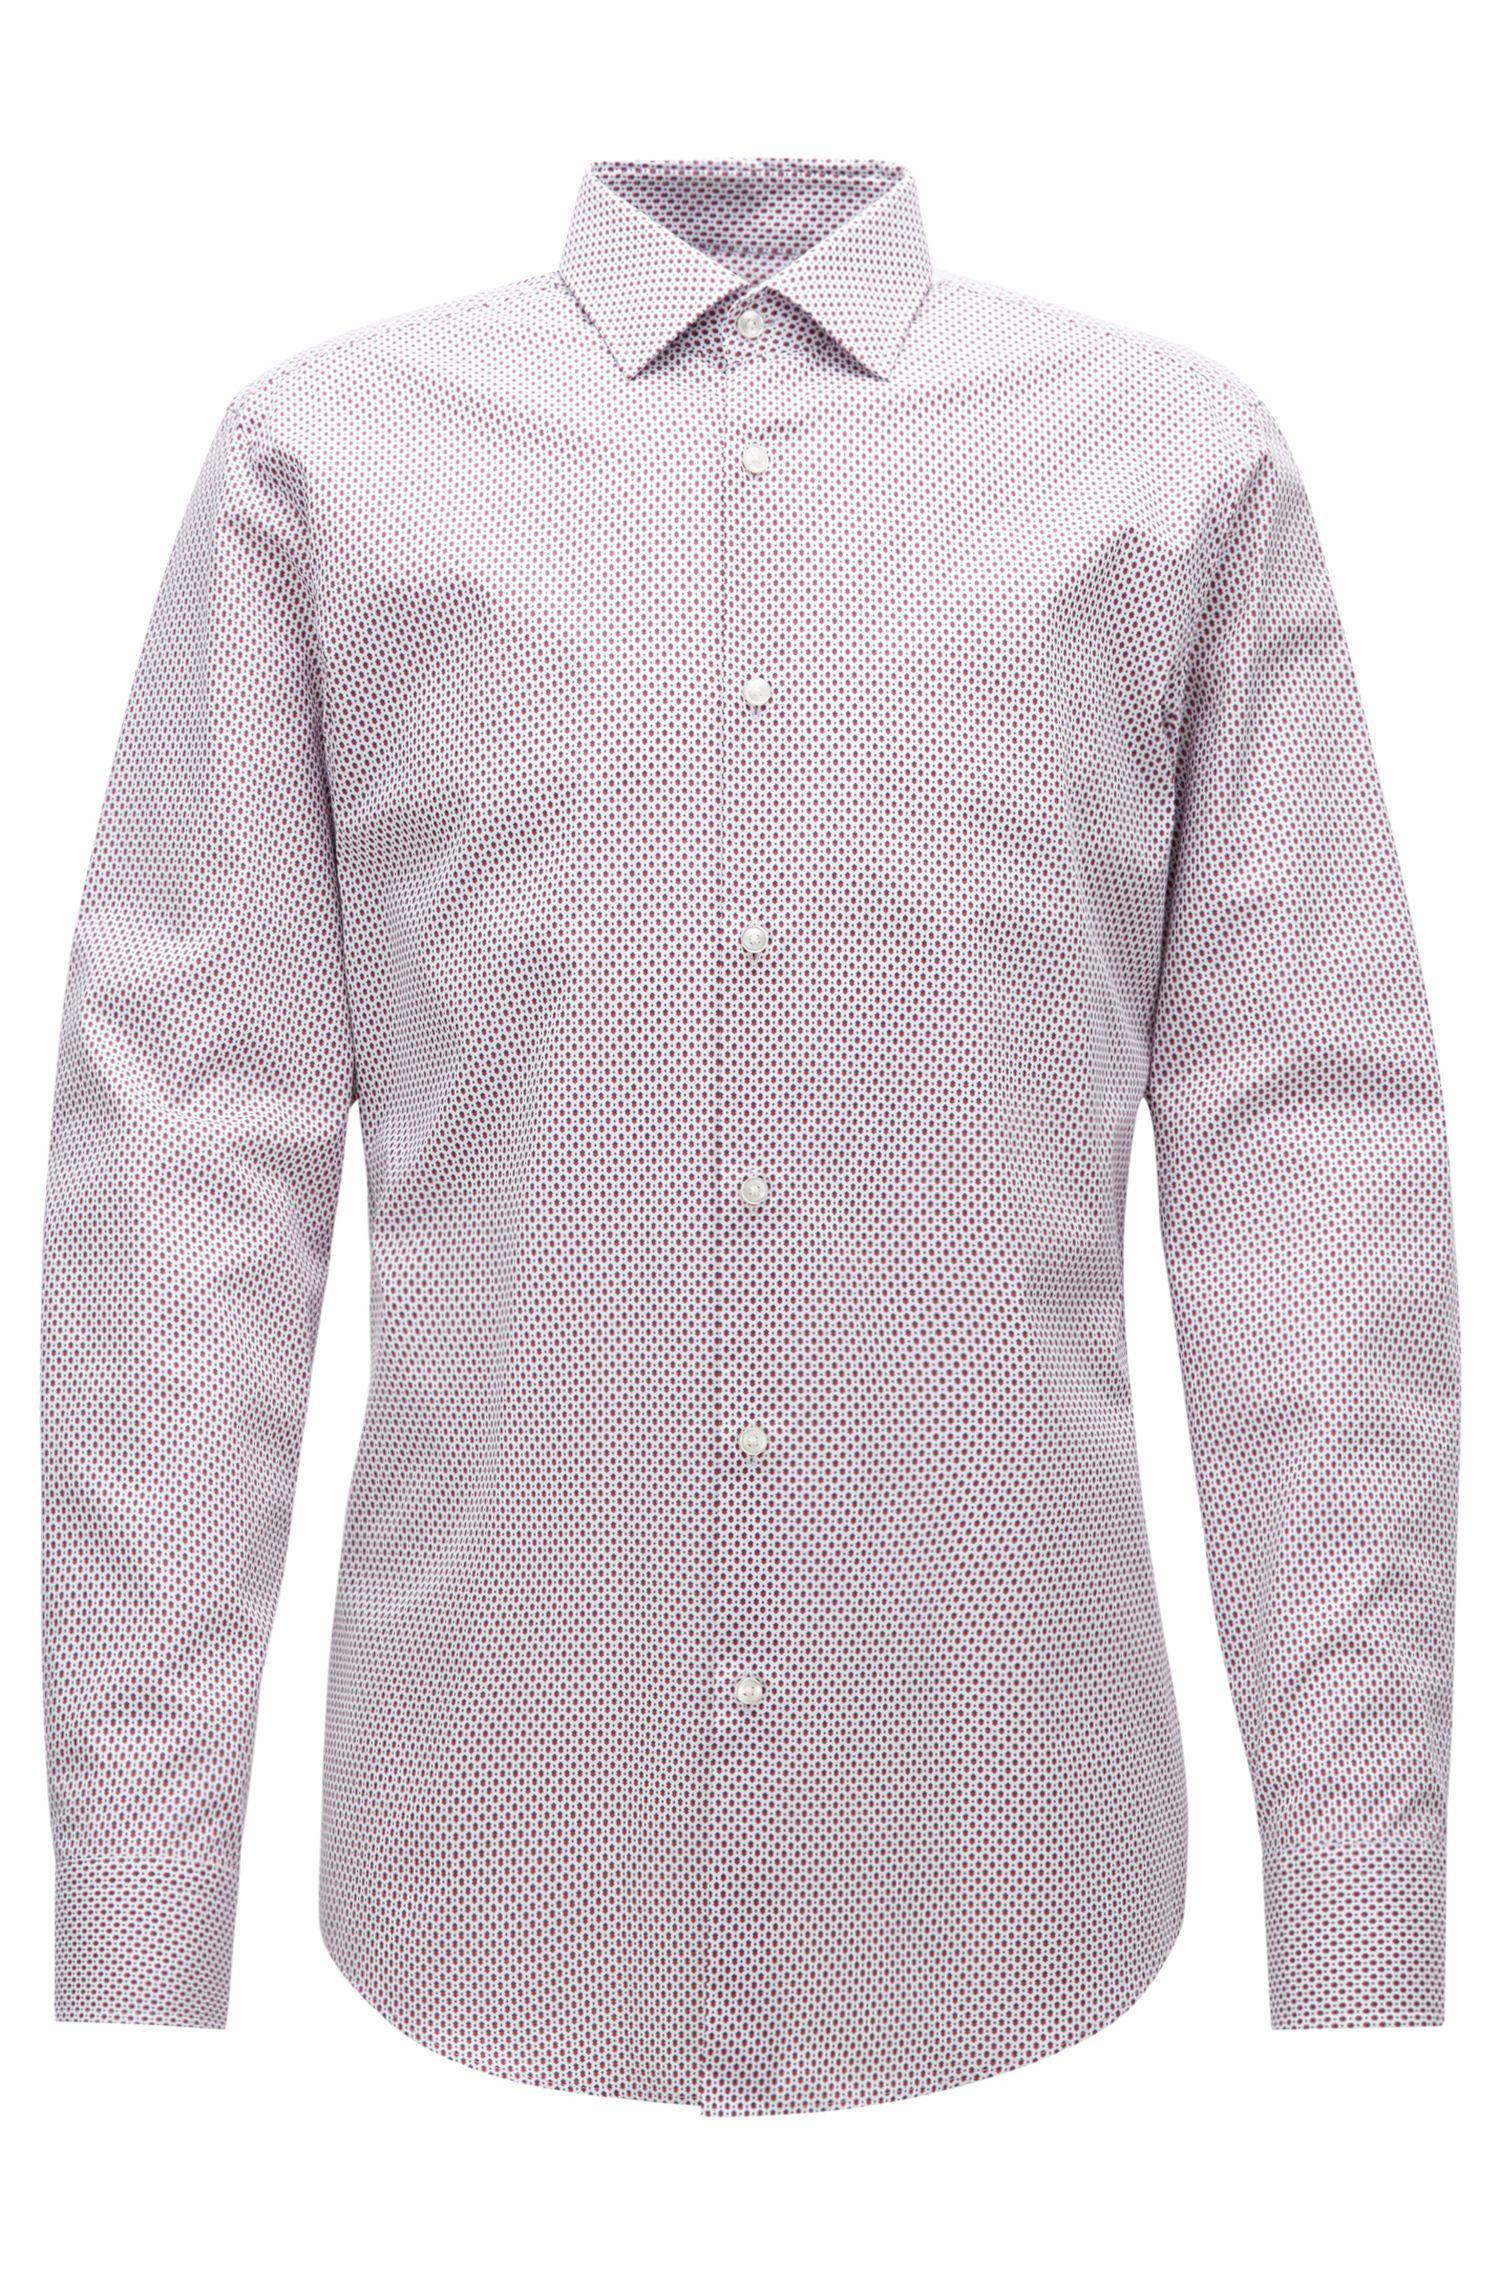 Geometric Cotton Dress Shirt, Slim Fit | Jenno